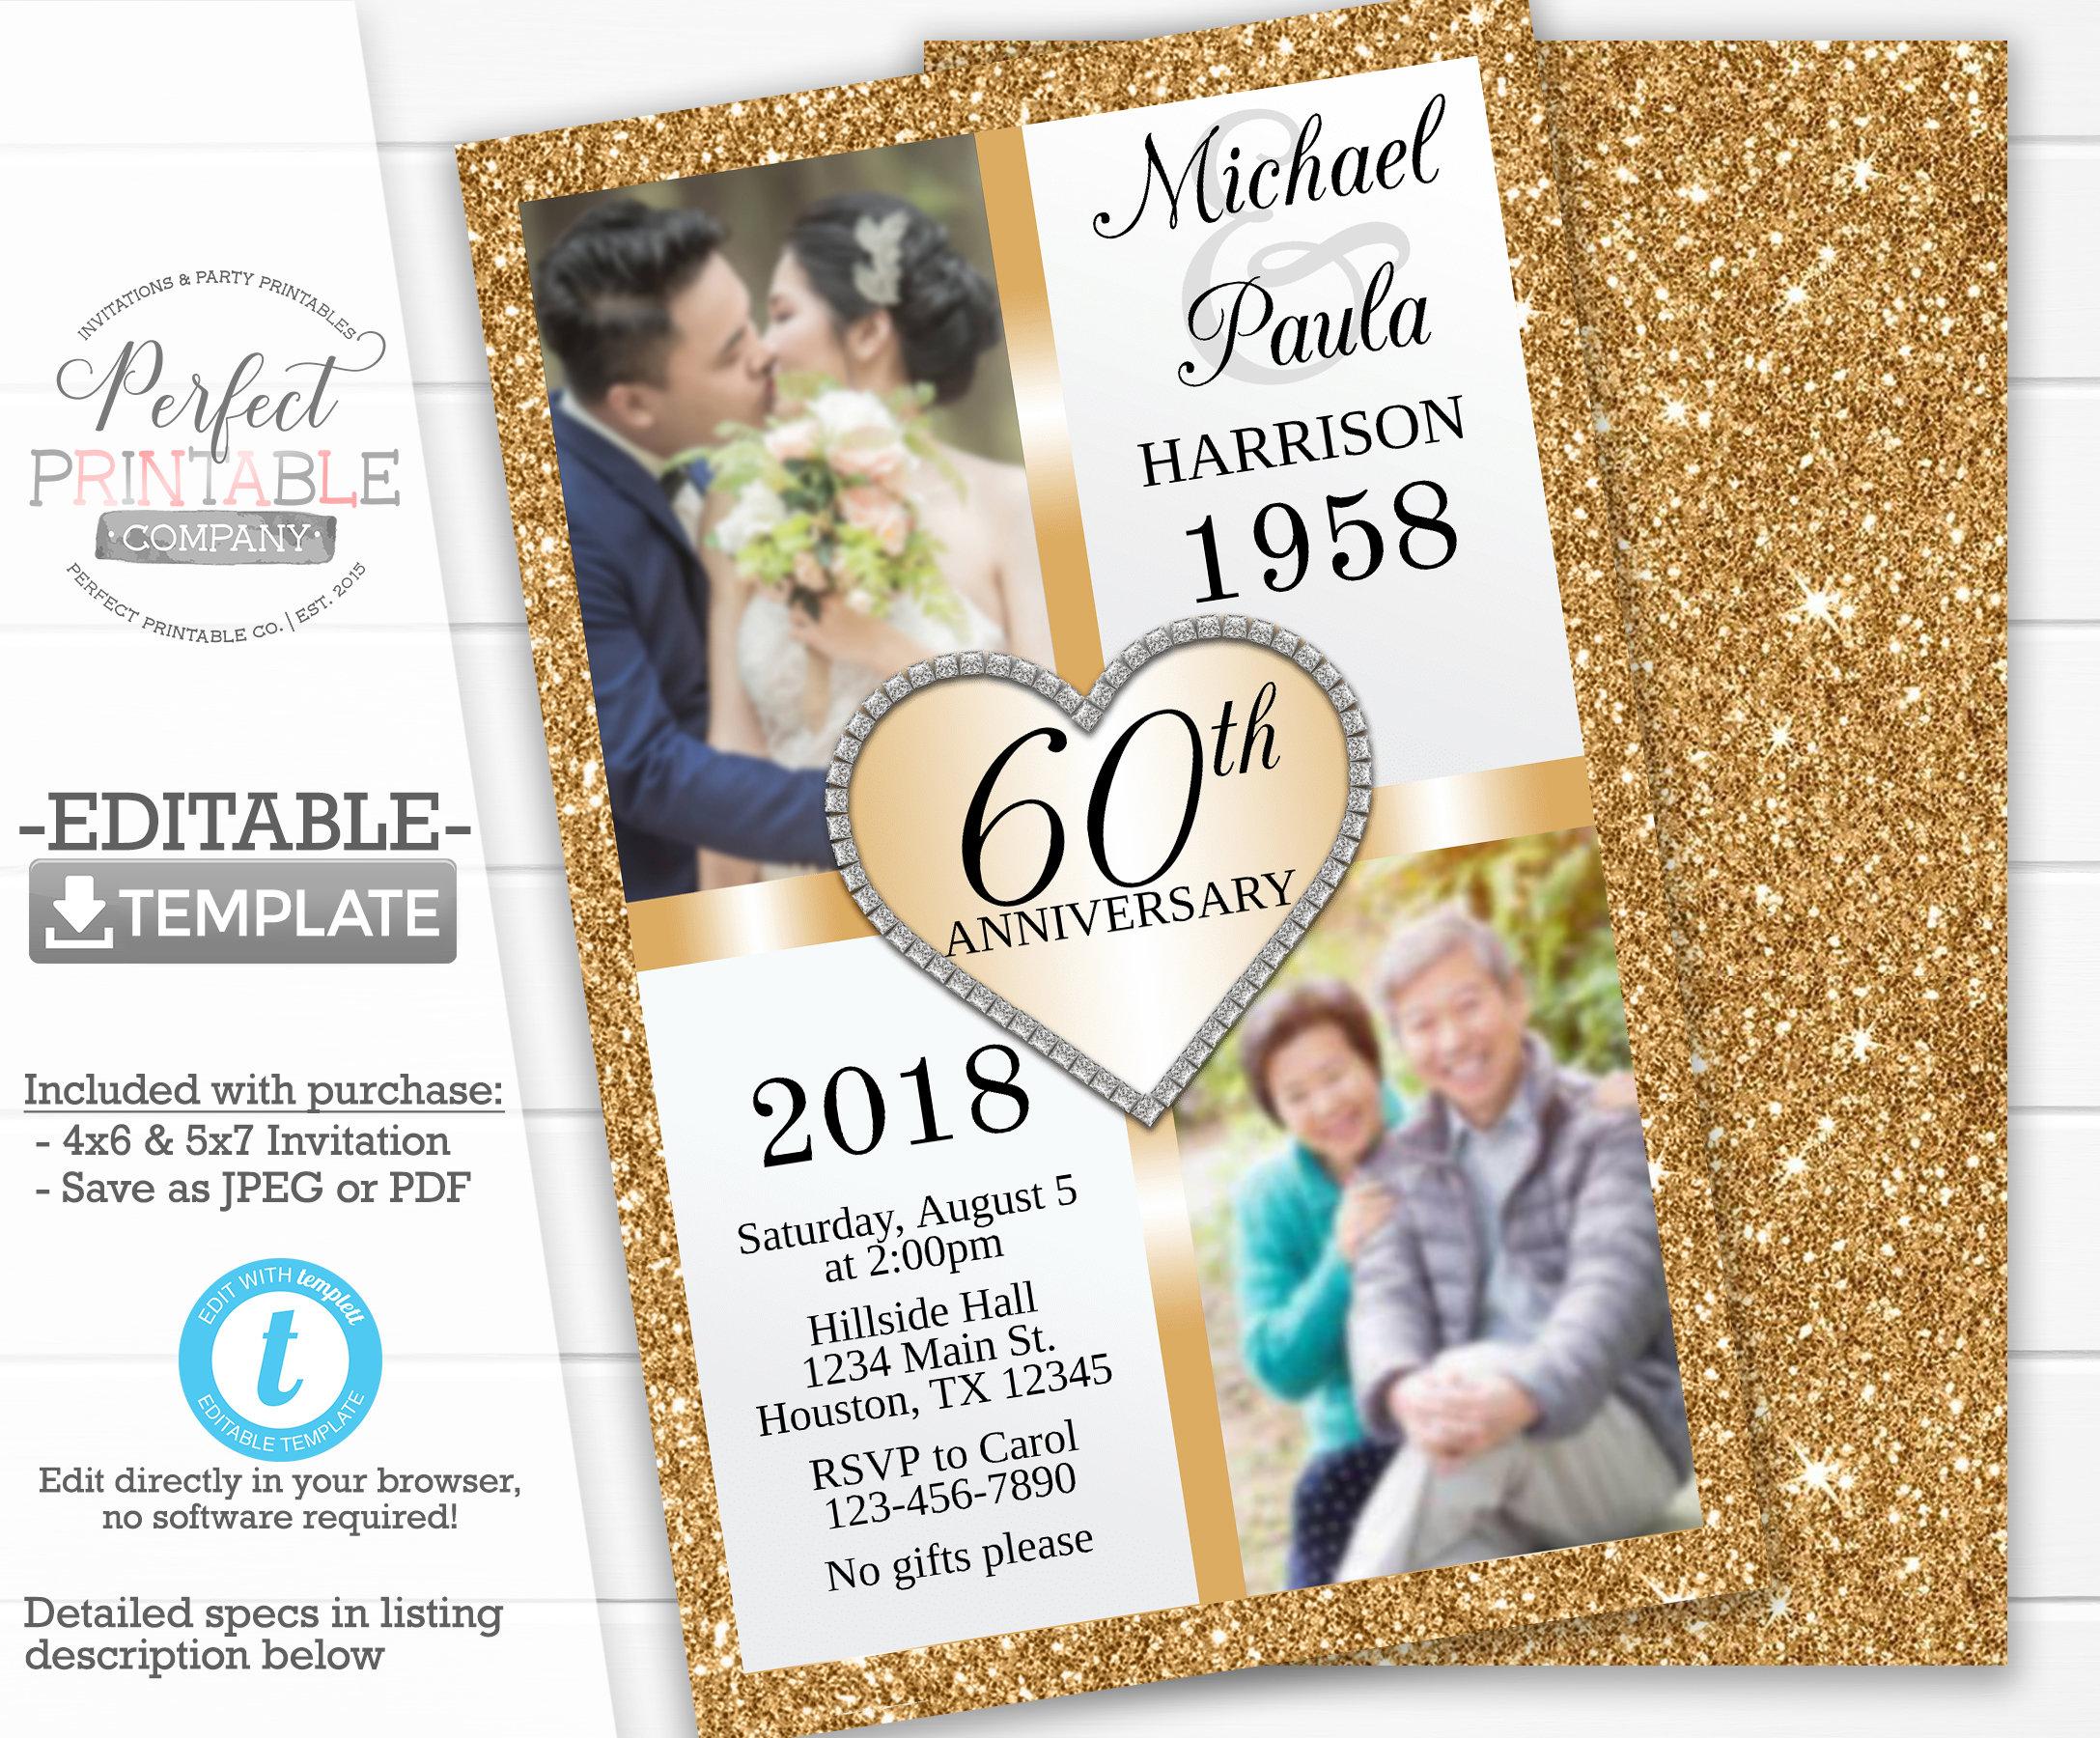 50th Anniversary Invitation Gold Wedding Anniversary Invitation Golden Anniversary Invitation 30th 40th 60th Editable Templett 316